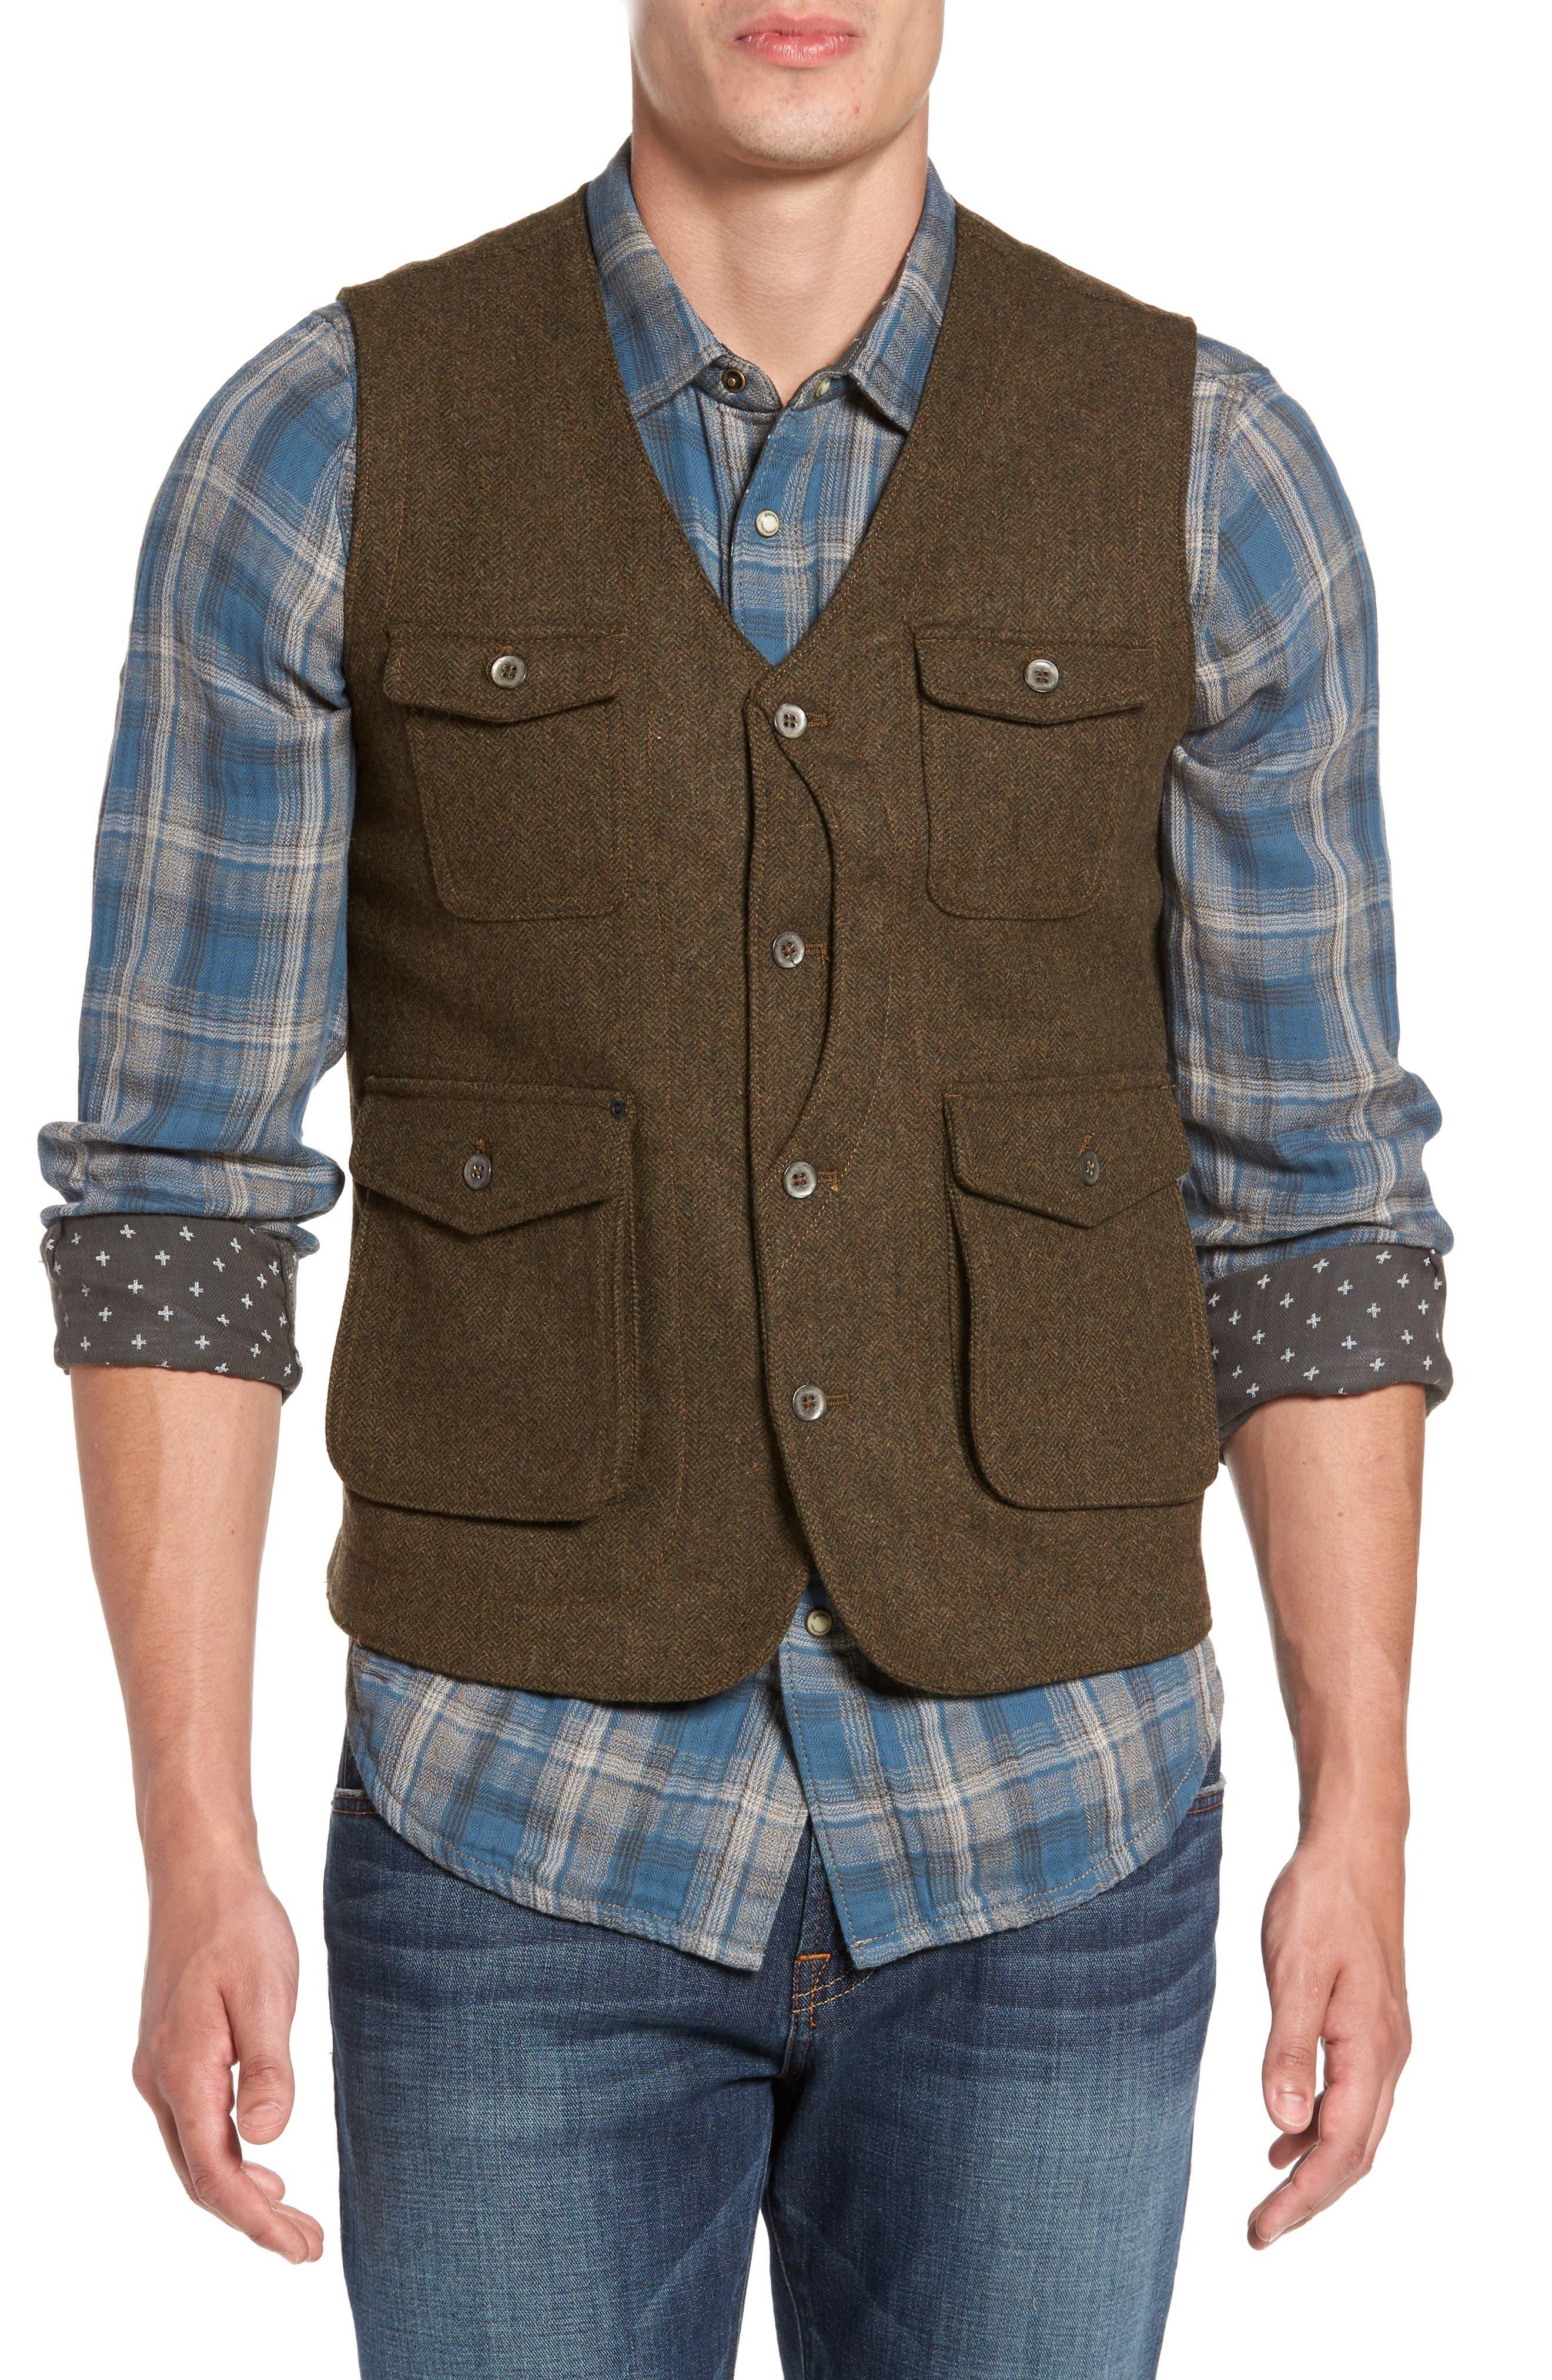 Jeremiah Porter Herringbone Wool Vest